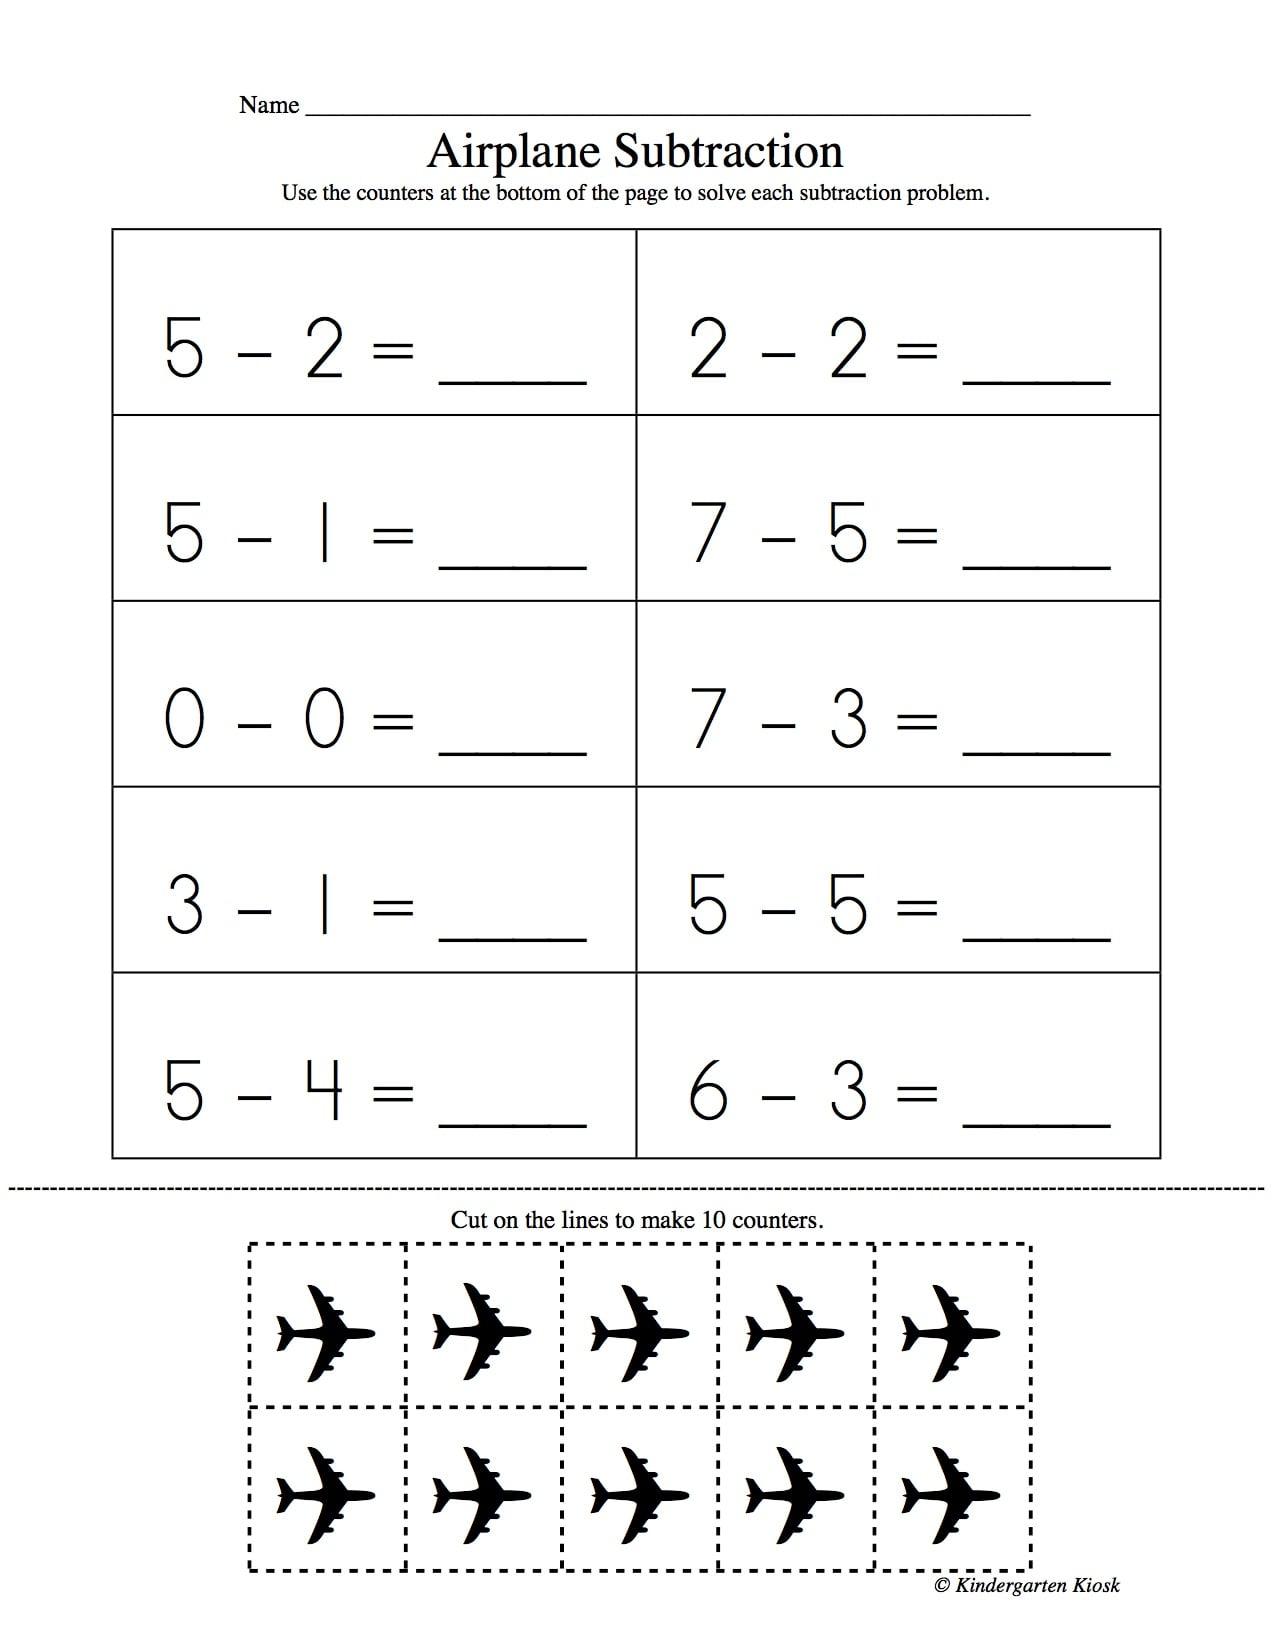 medium resolution of Subtraction Worksheets for Kindergarten — Kindergarten Kiosk